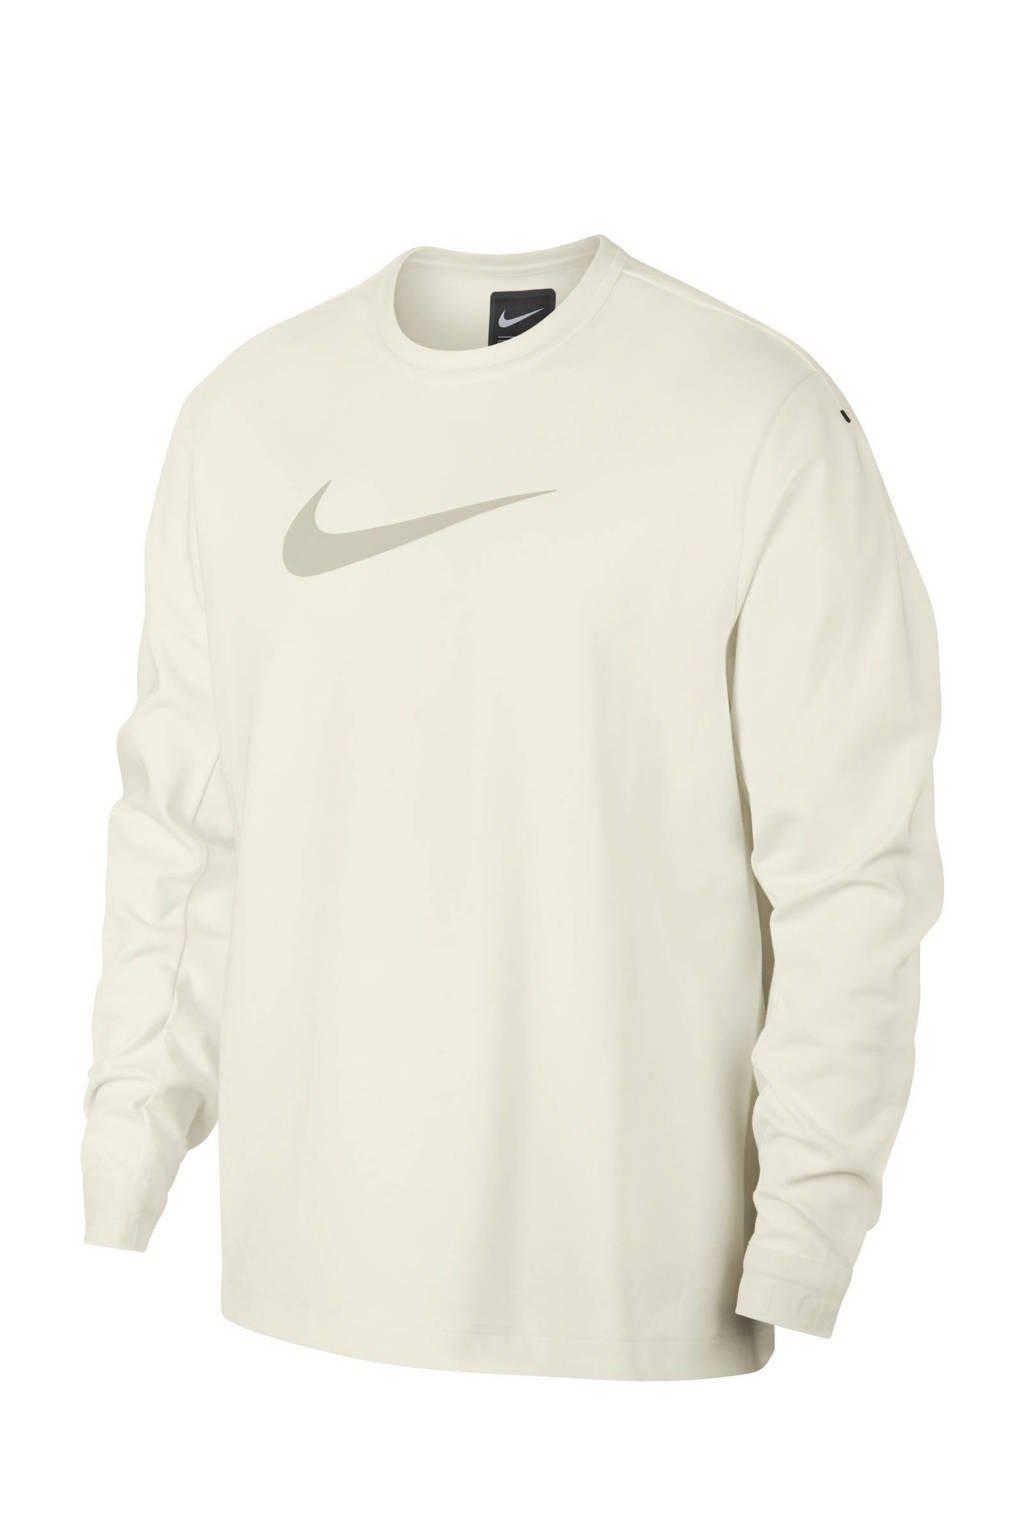 Nike   sweater, Wit